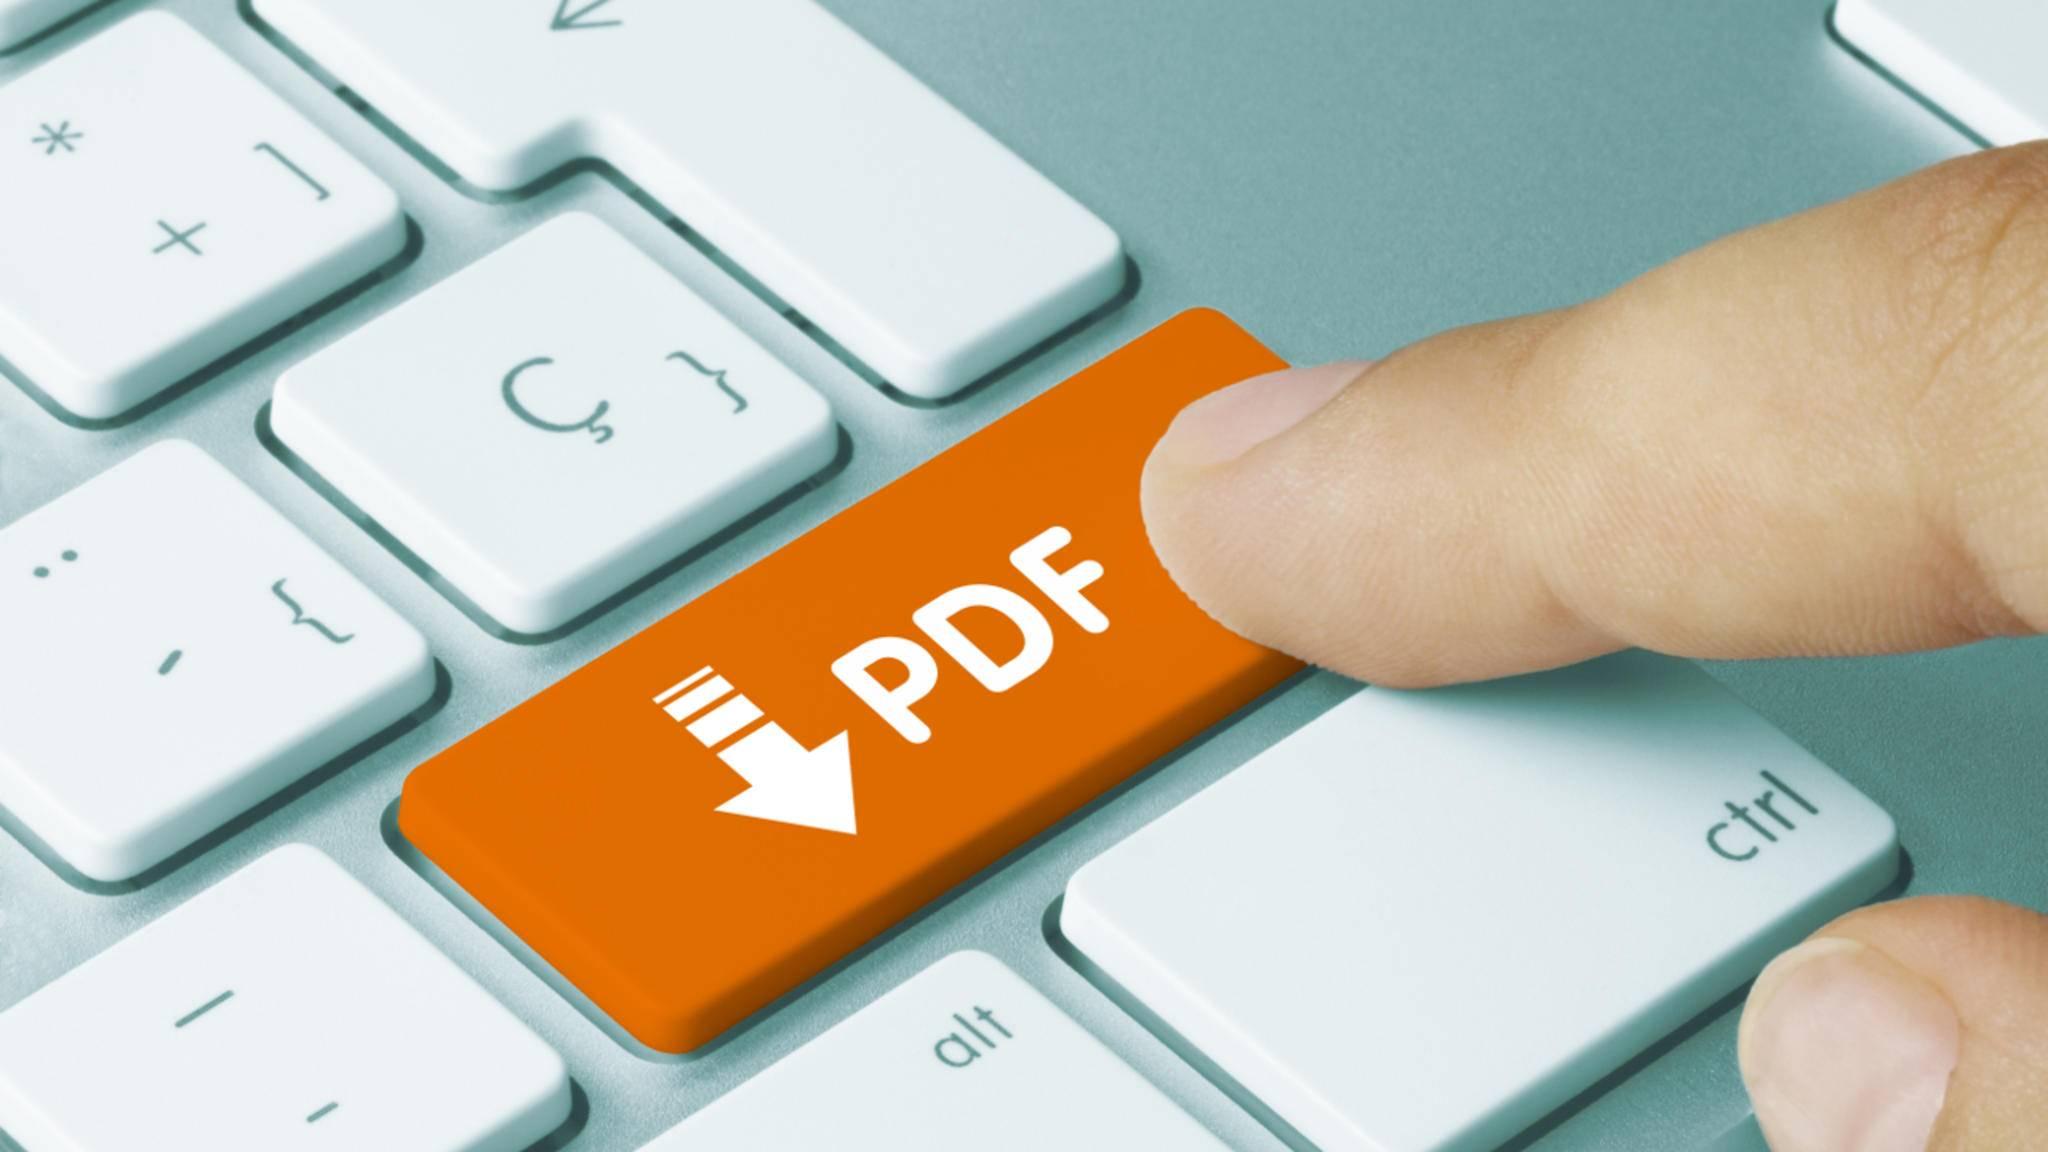 Text aus PDF kopieren: So geht's